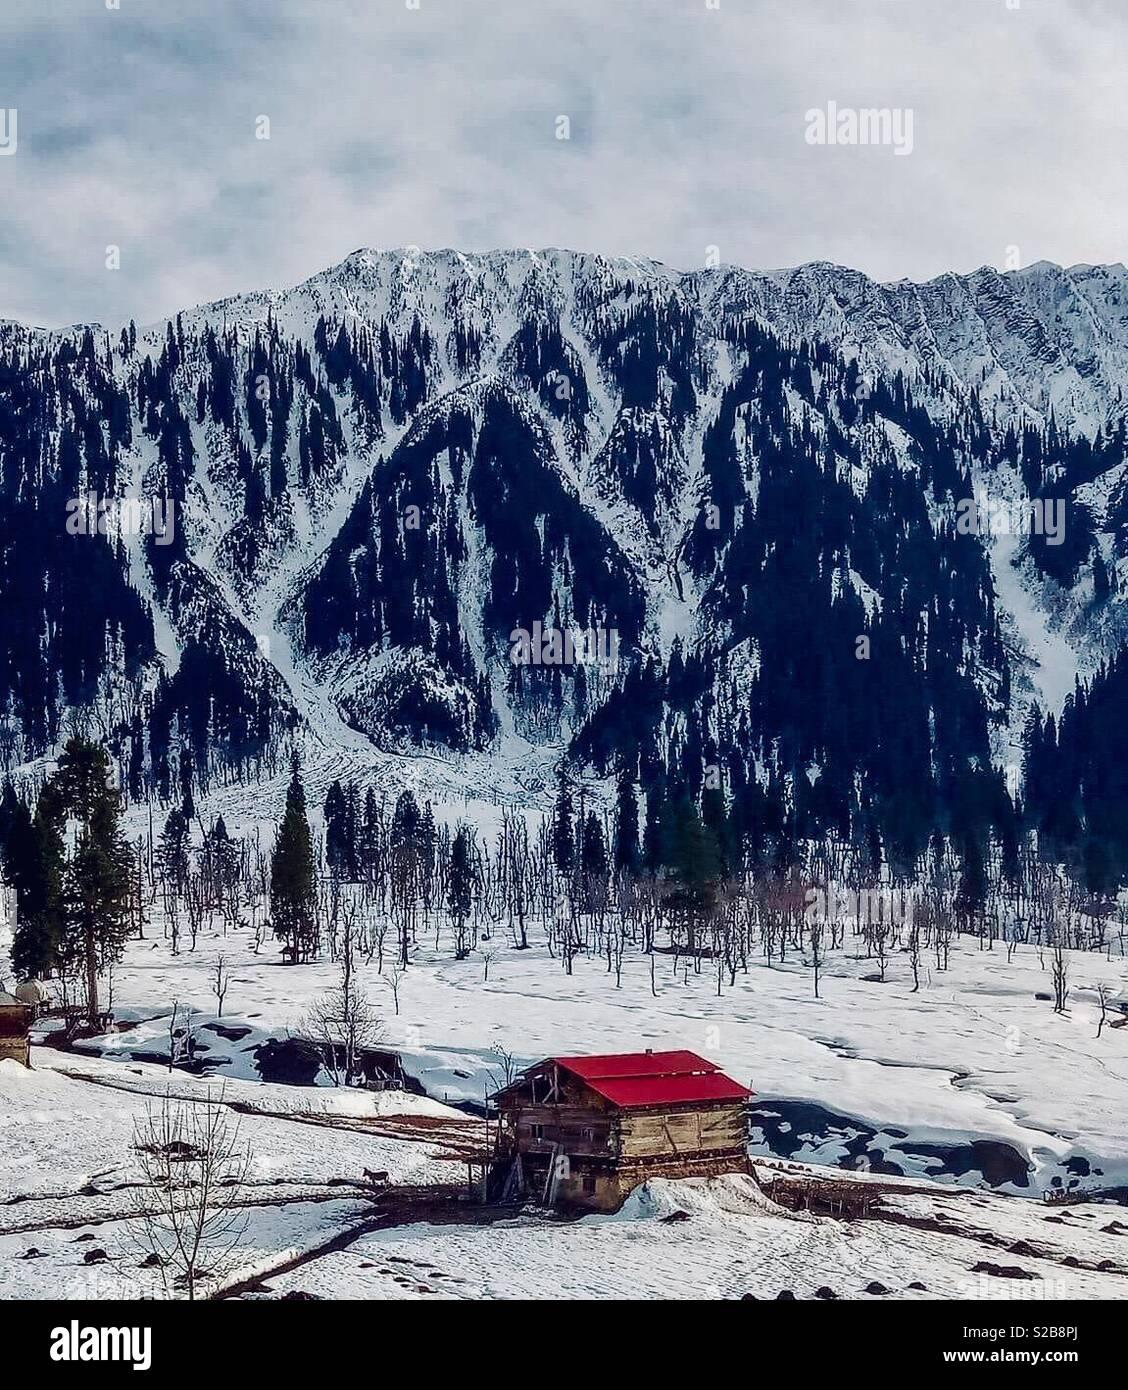 Zona norte de Pakistán Imagen De Stock